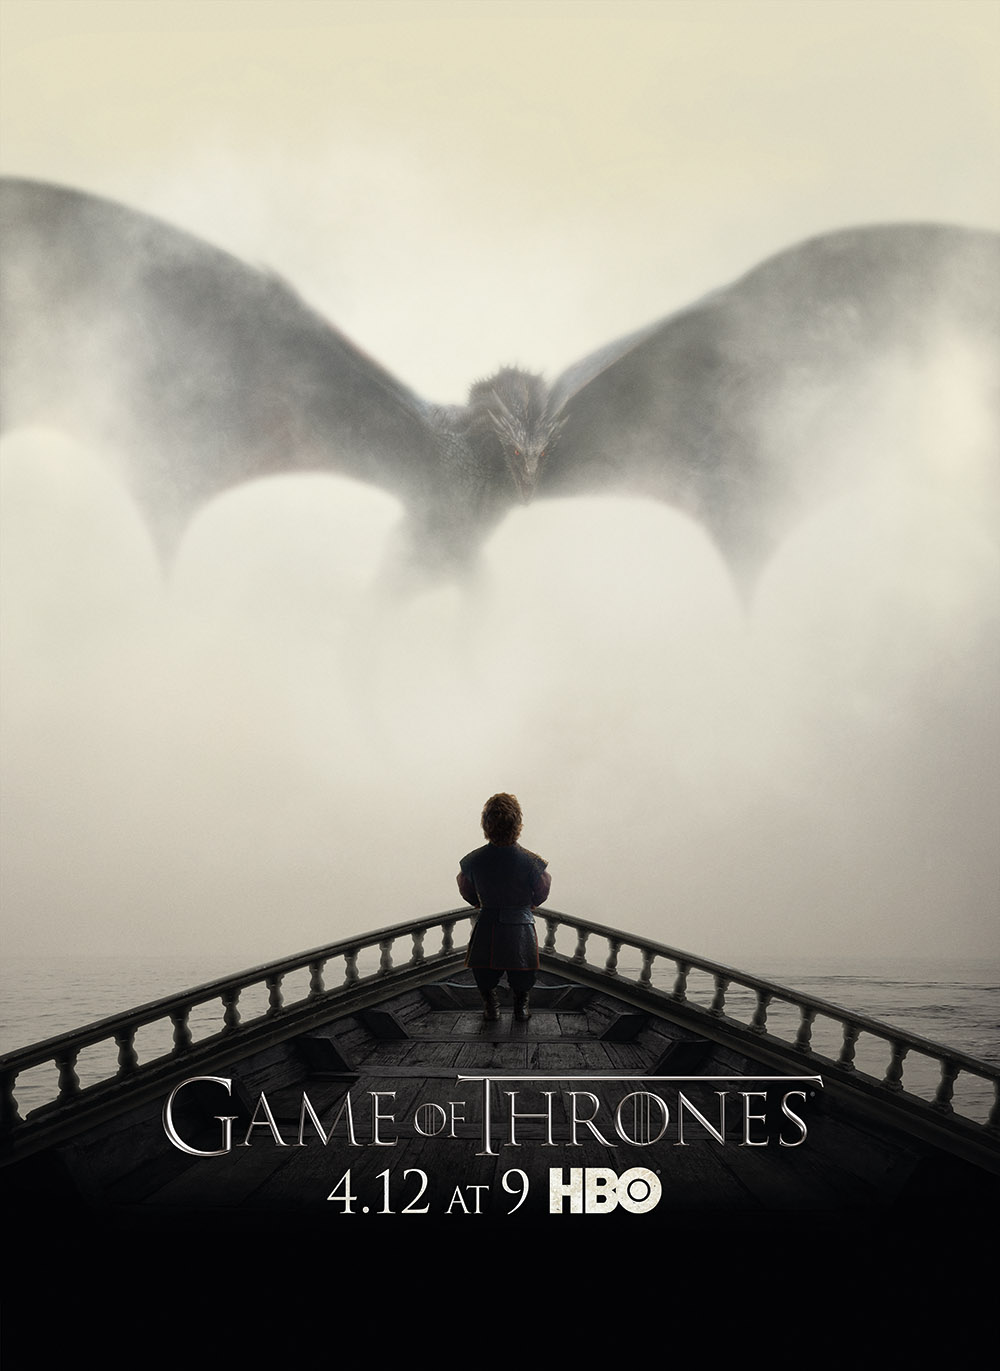 Season5-KeyArt-Tyrion-Lannister-Dragon